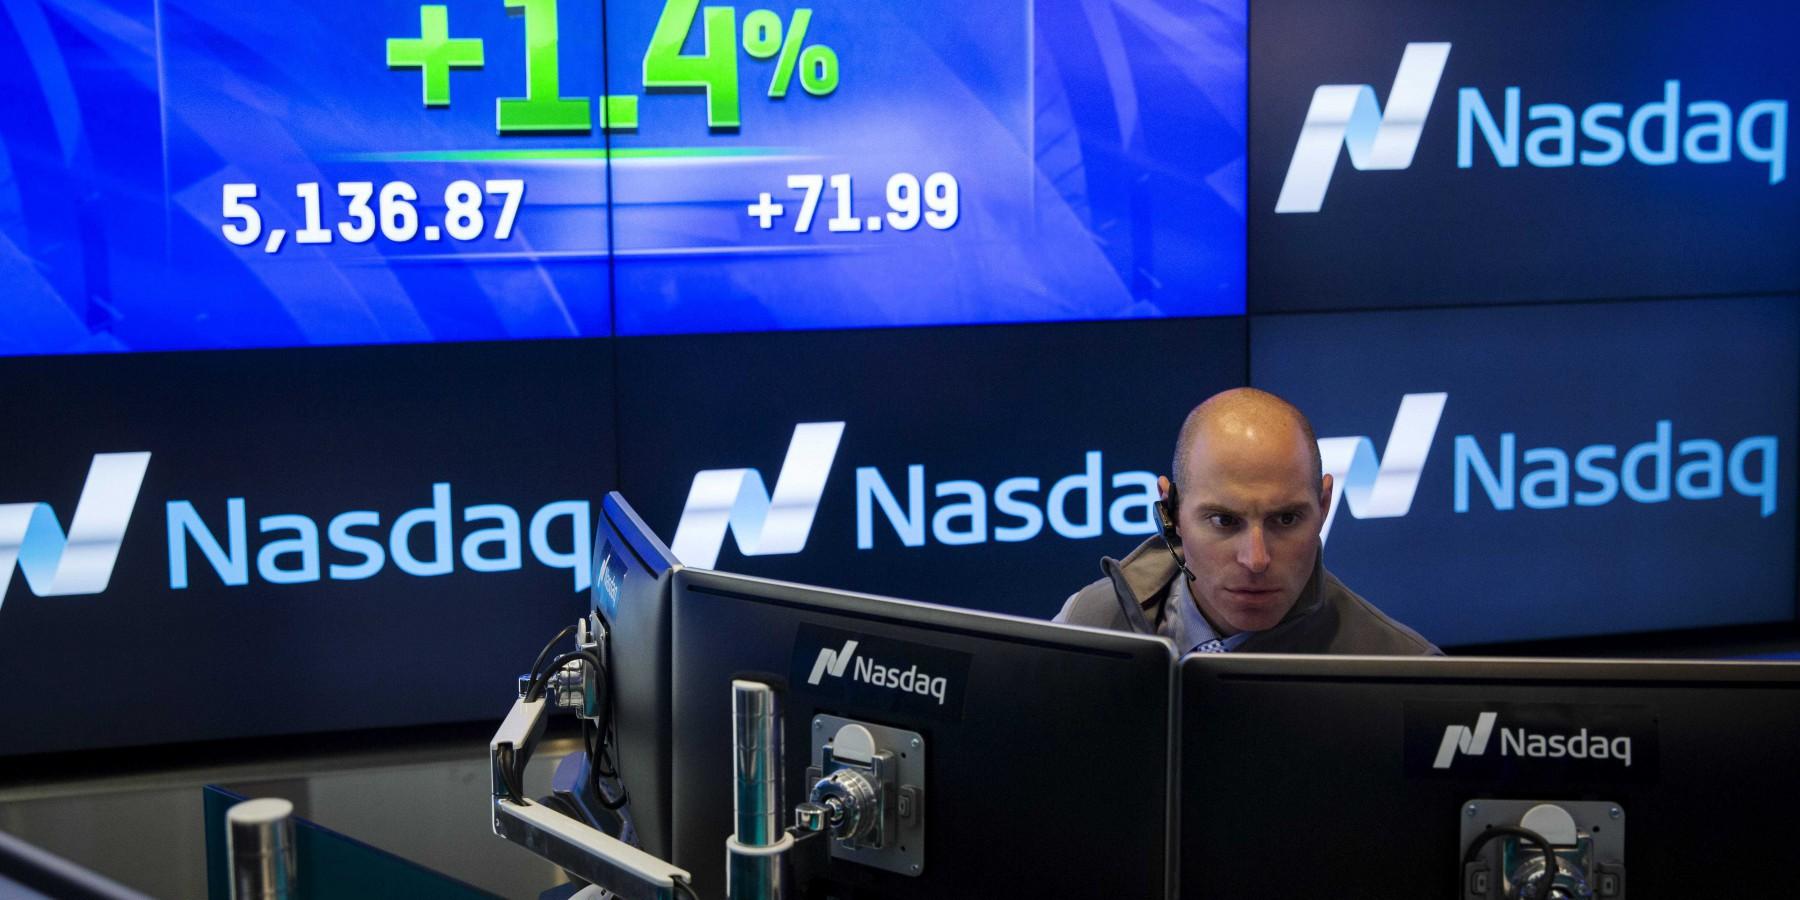 A trader gazes into a screen at Nasdaq.